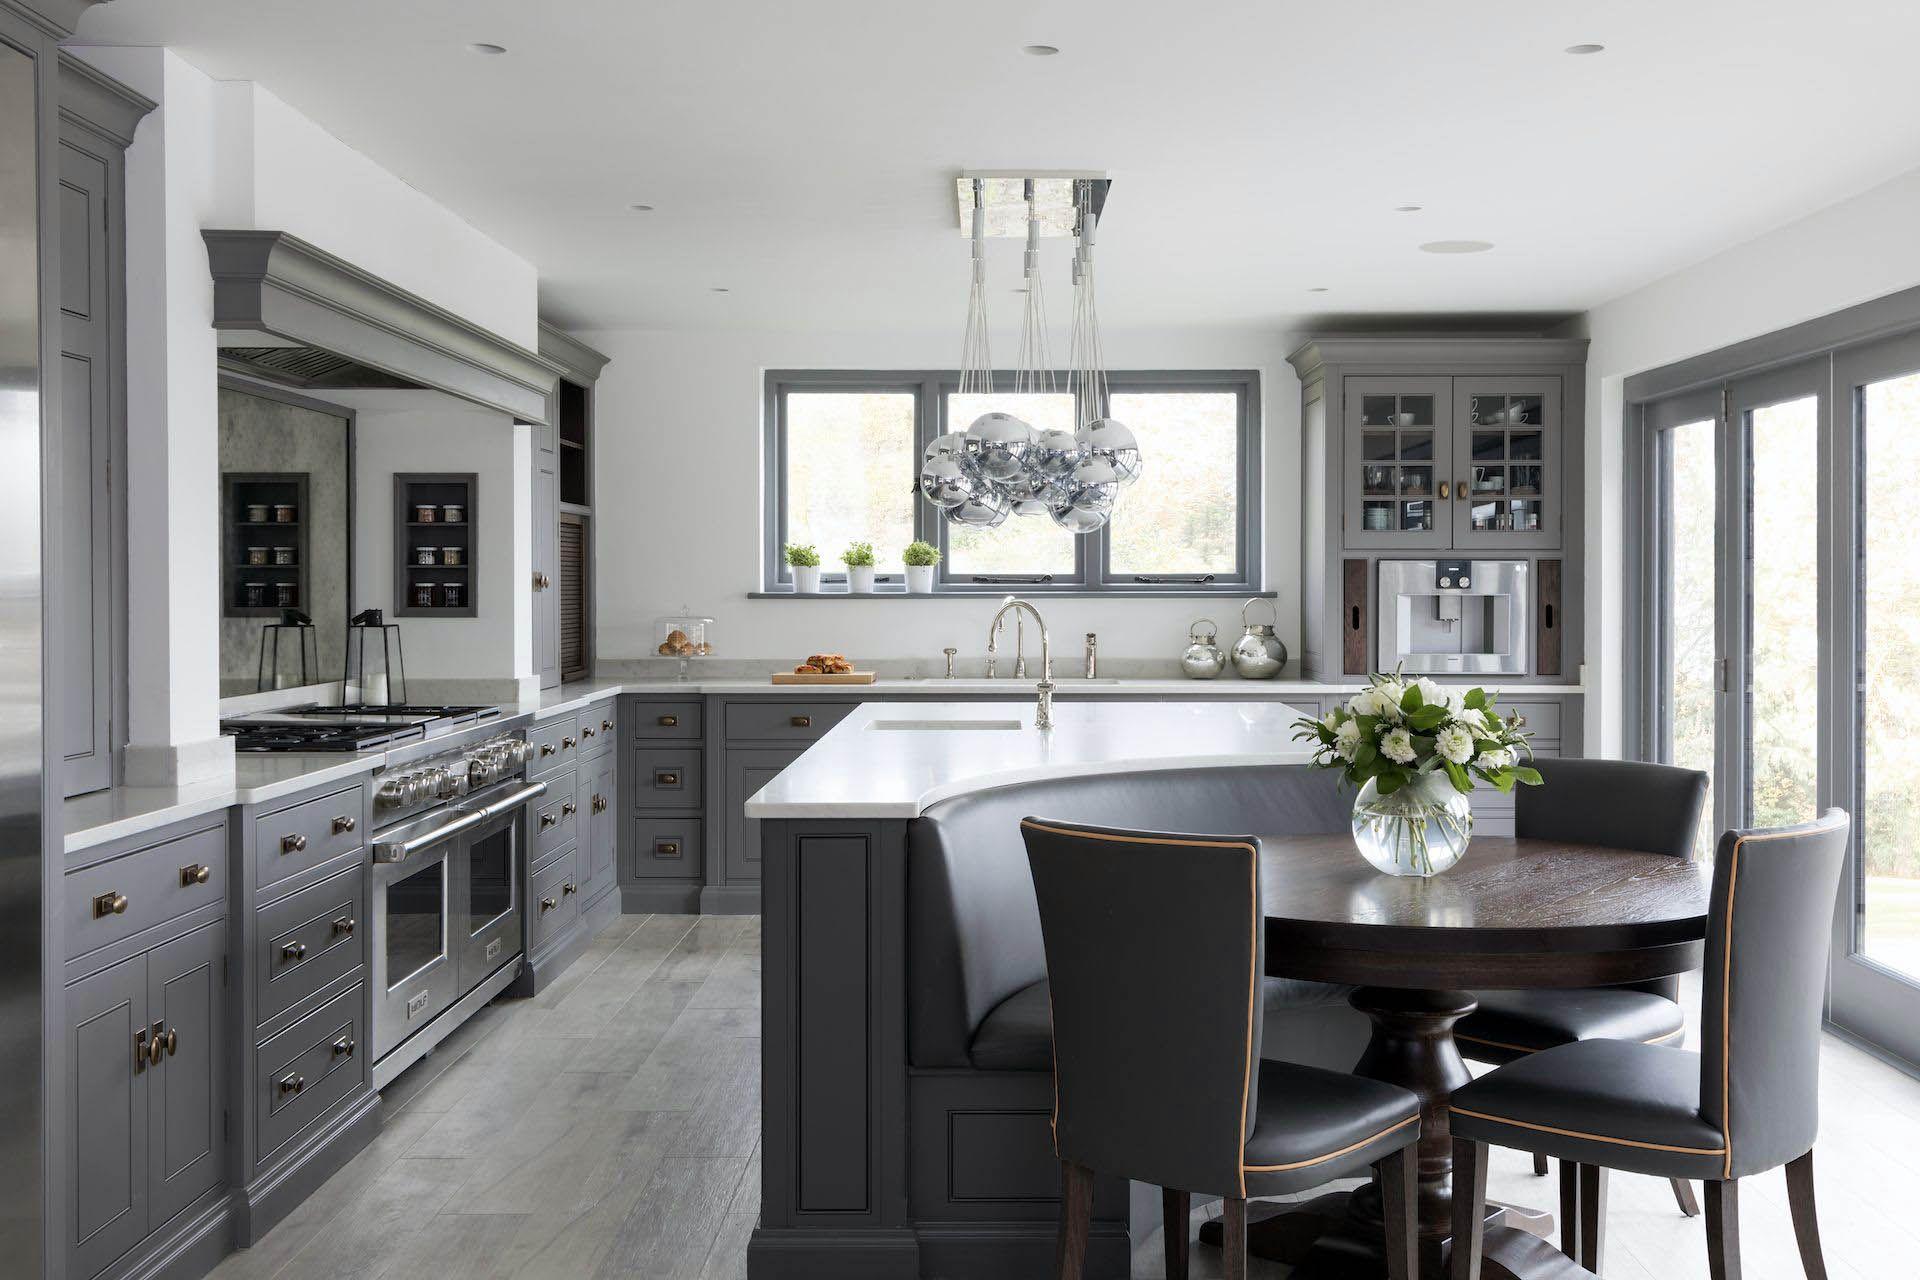 superior luxury european kitchen cabinets for 2019 luxury kitchen design home decor kitchen on kitchen ideas european id=66400